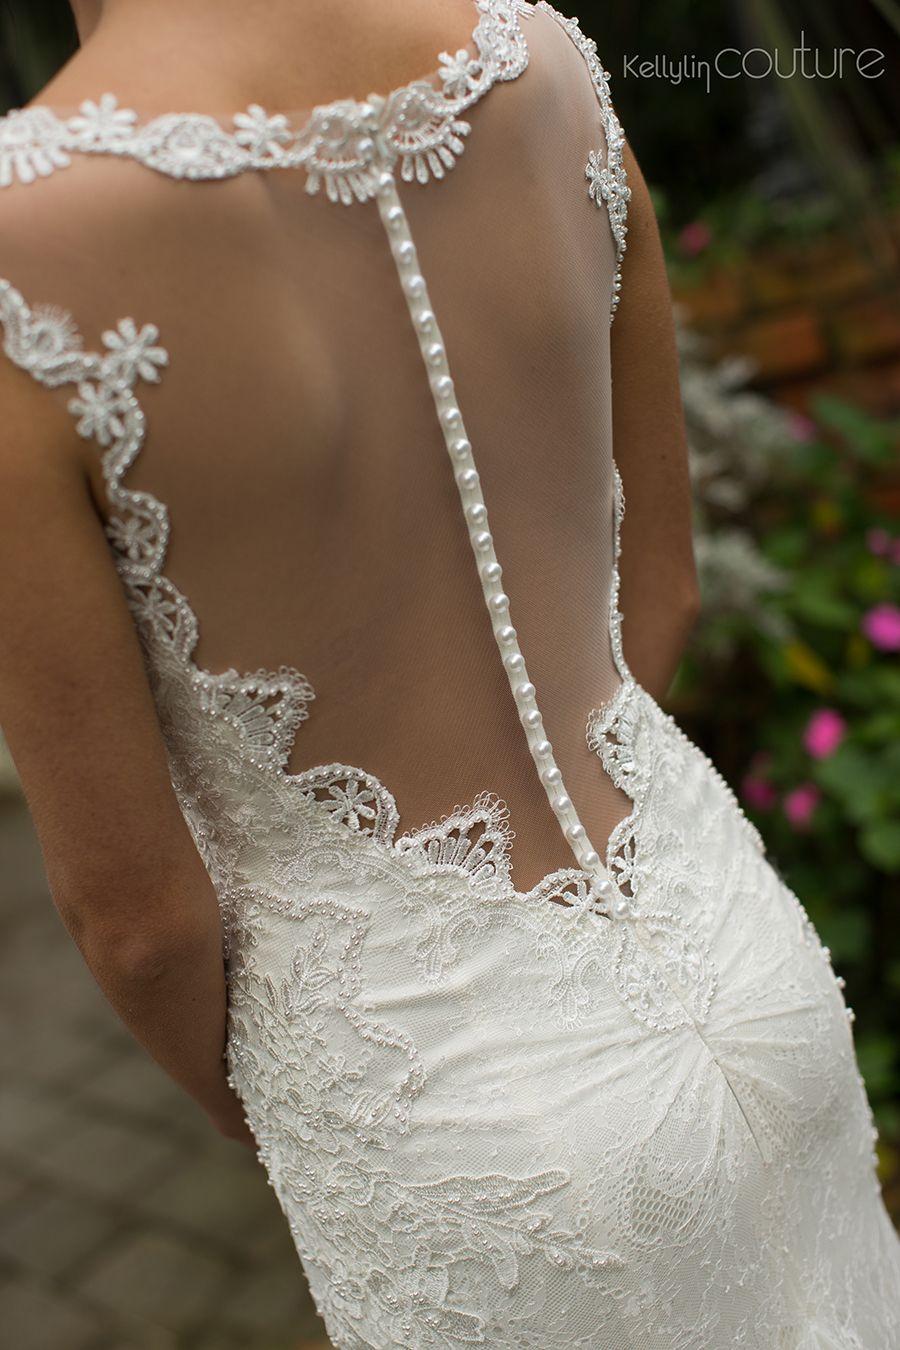 Wedding dresses perth western australia bridal wedding gowns in wedding dresses perth western australia bridal wedding gowns in leederville ombrellifo Images